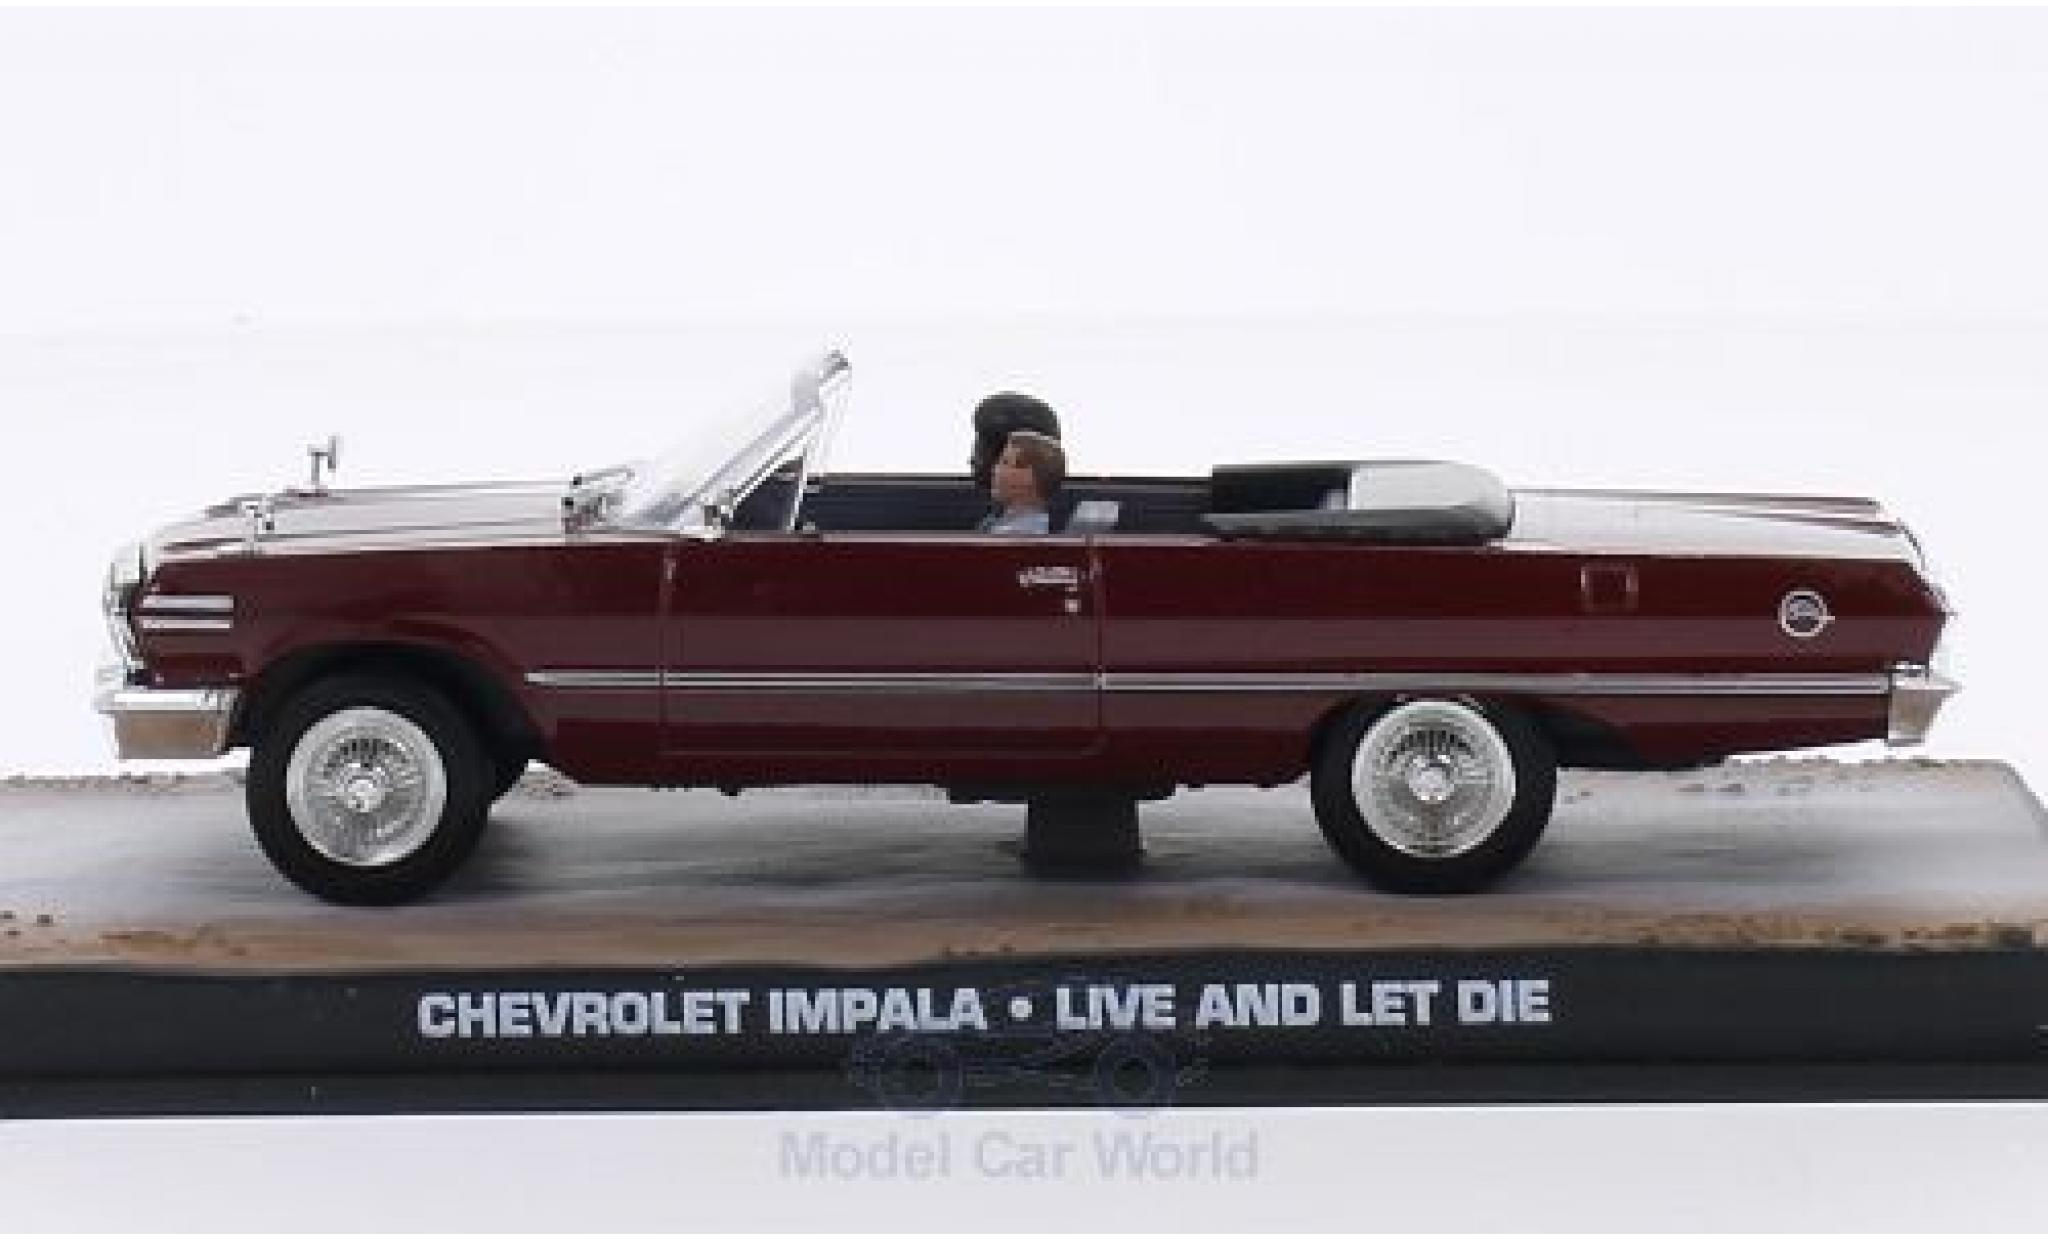 Chevrolet Impala 1/43 SpecialC 007 Convertible rouge James Bond 007 Leben und sterben lassen ohne Vitrine